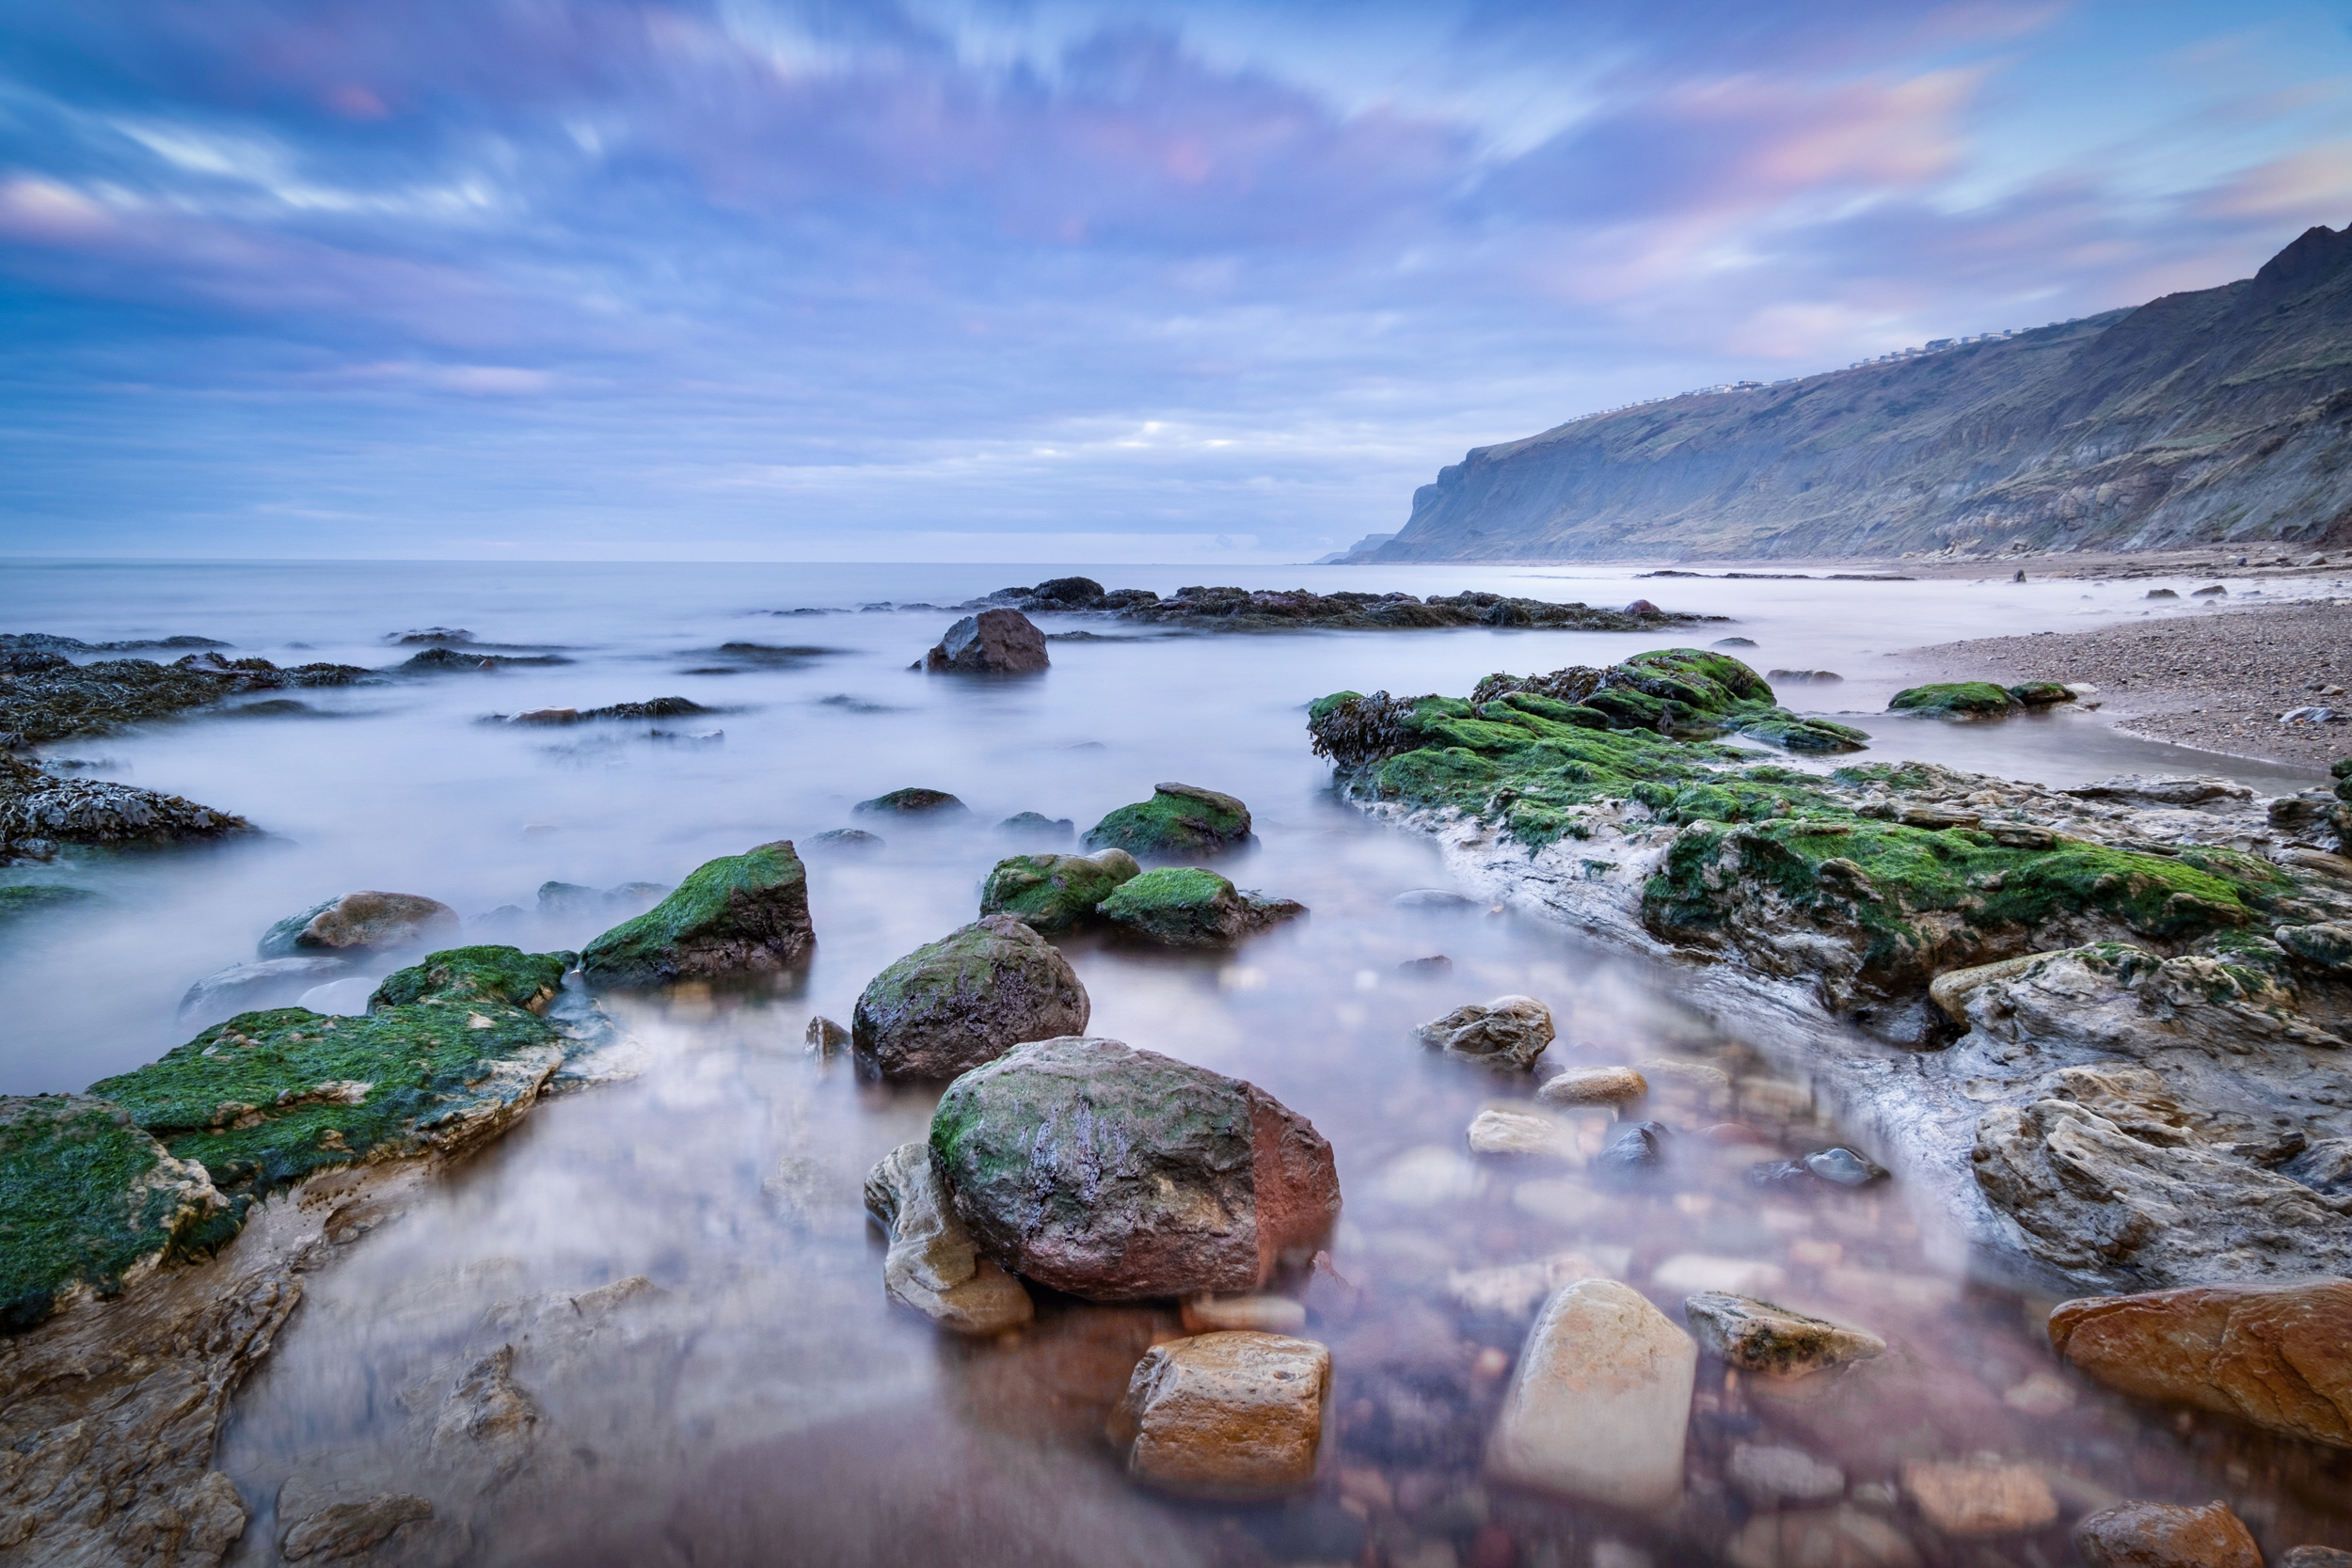 Long exposure seascape at Cayton Bay, North Yorkshire, England